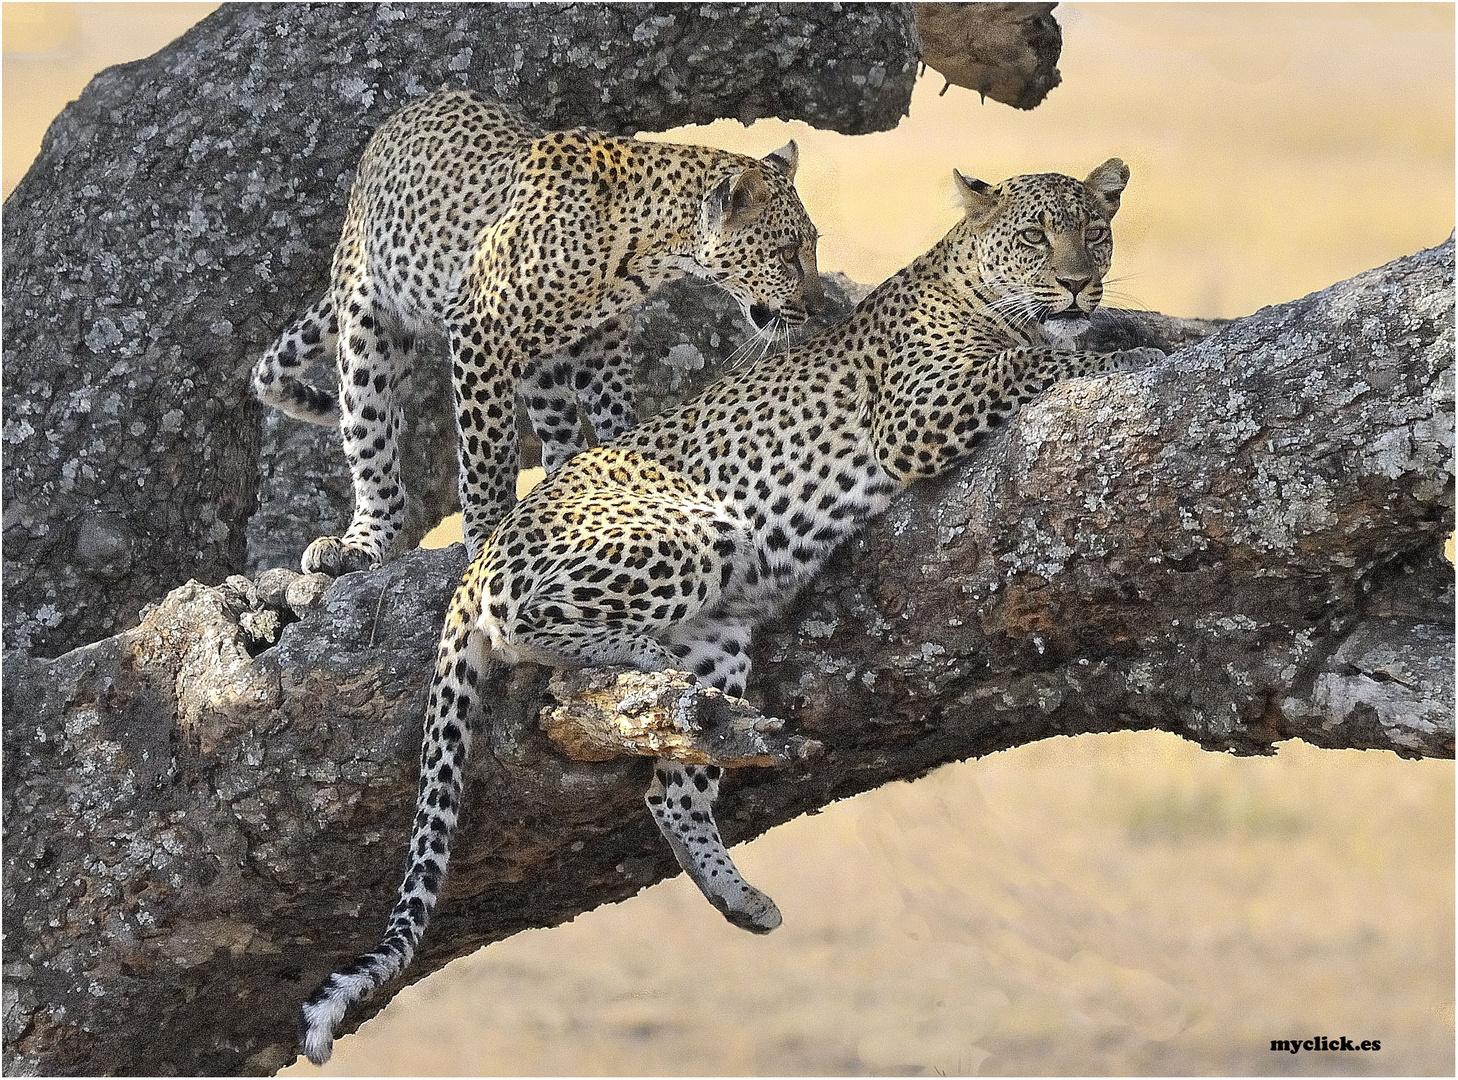 MEMORIAS DE AFRICA-DOS LEOPARDOS-PN DEL SERENGUETI -TANZANIA